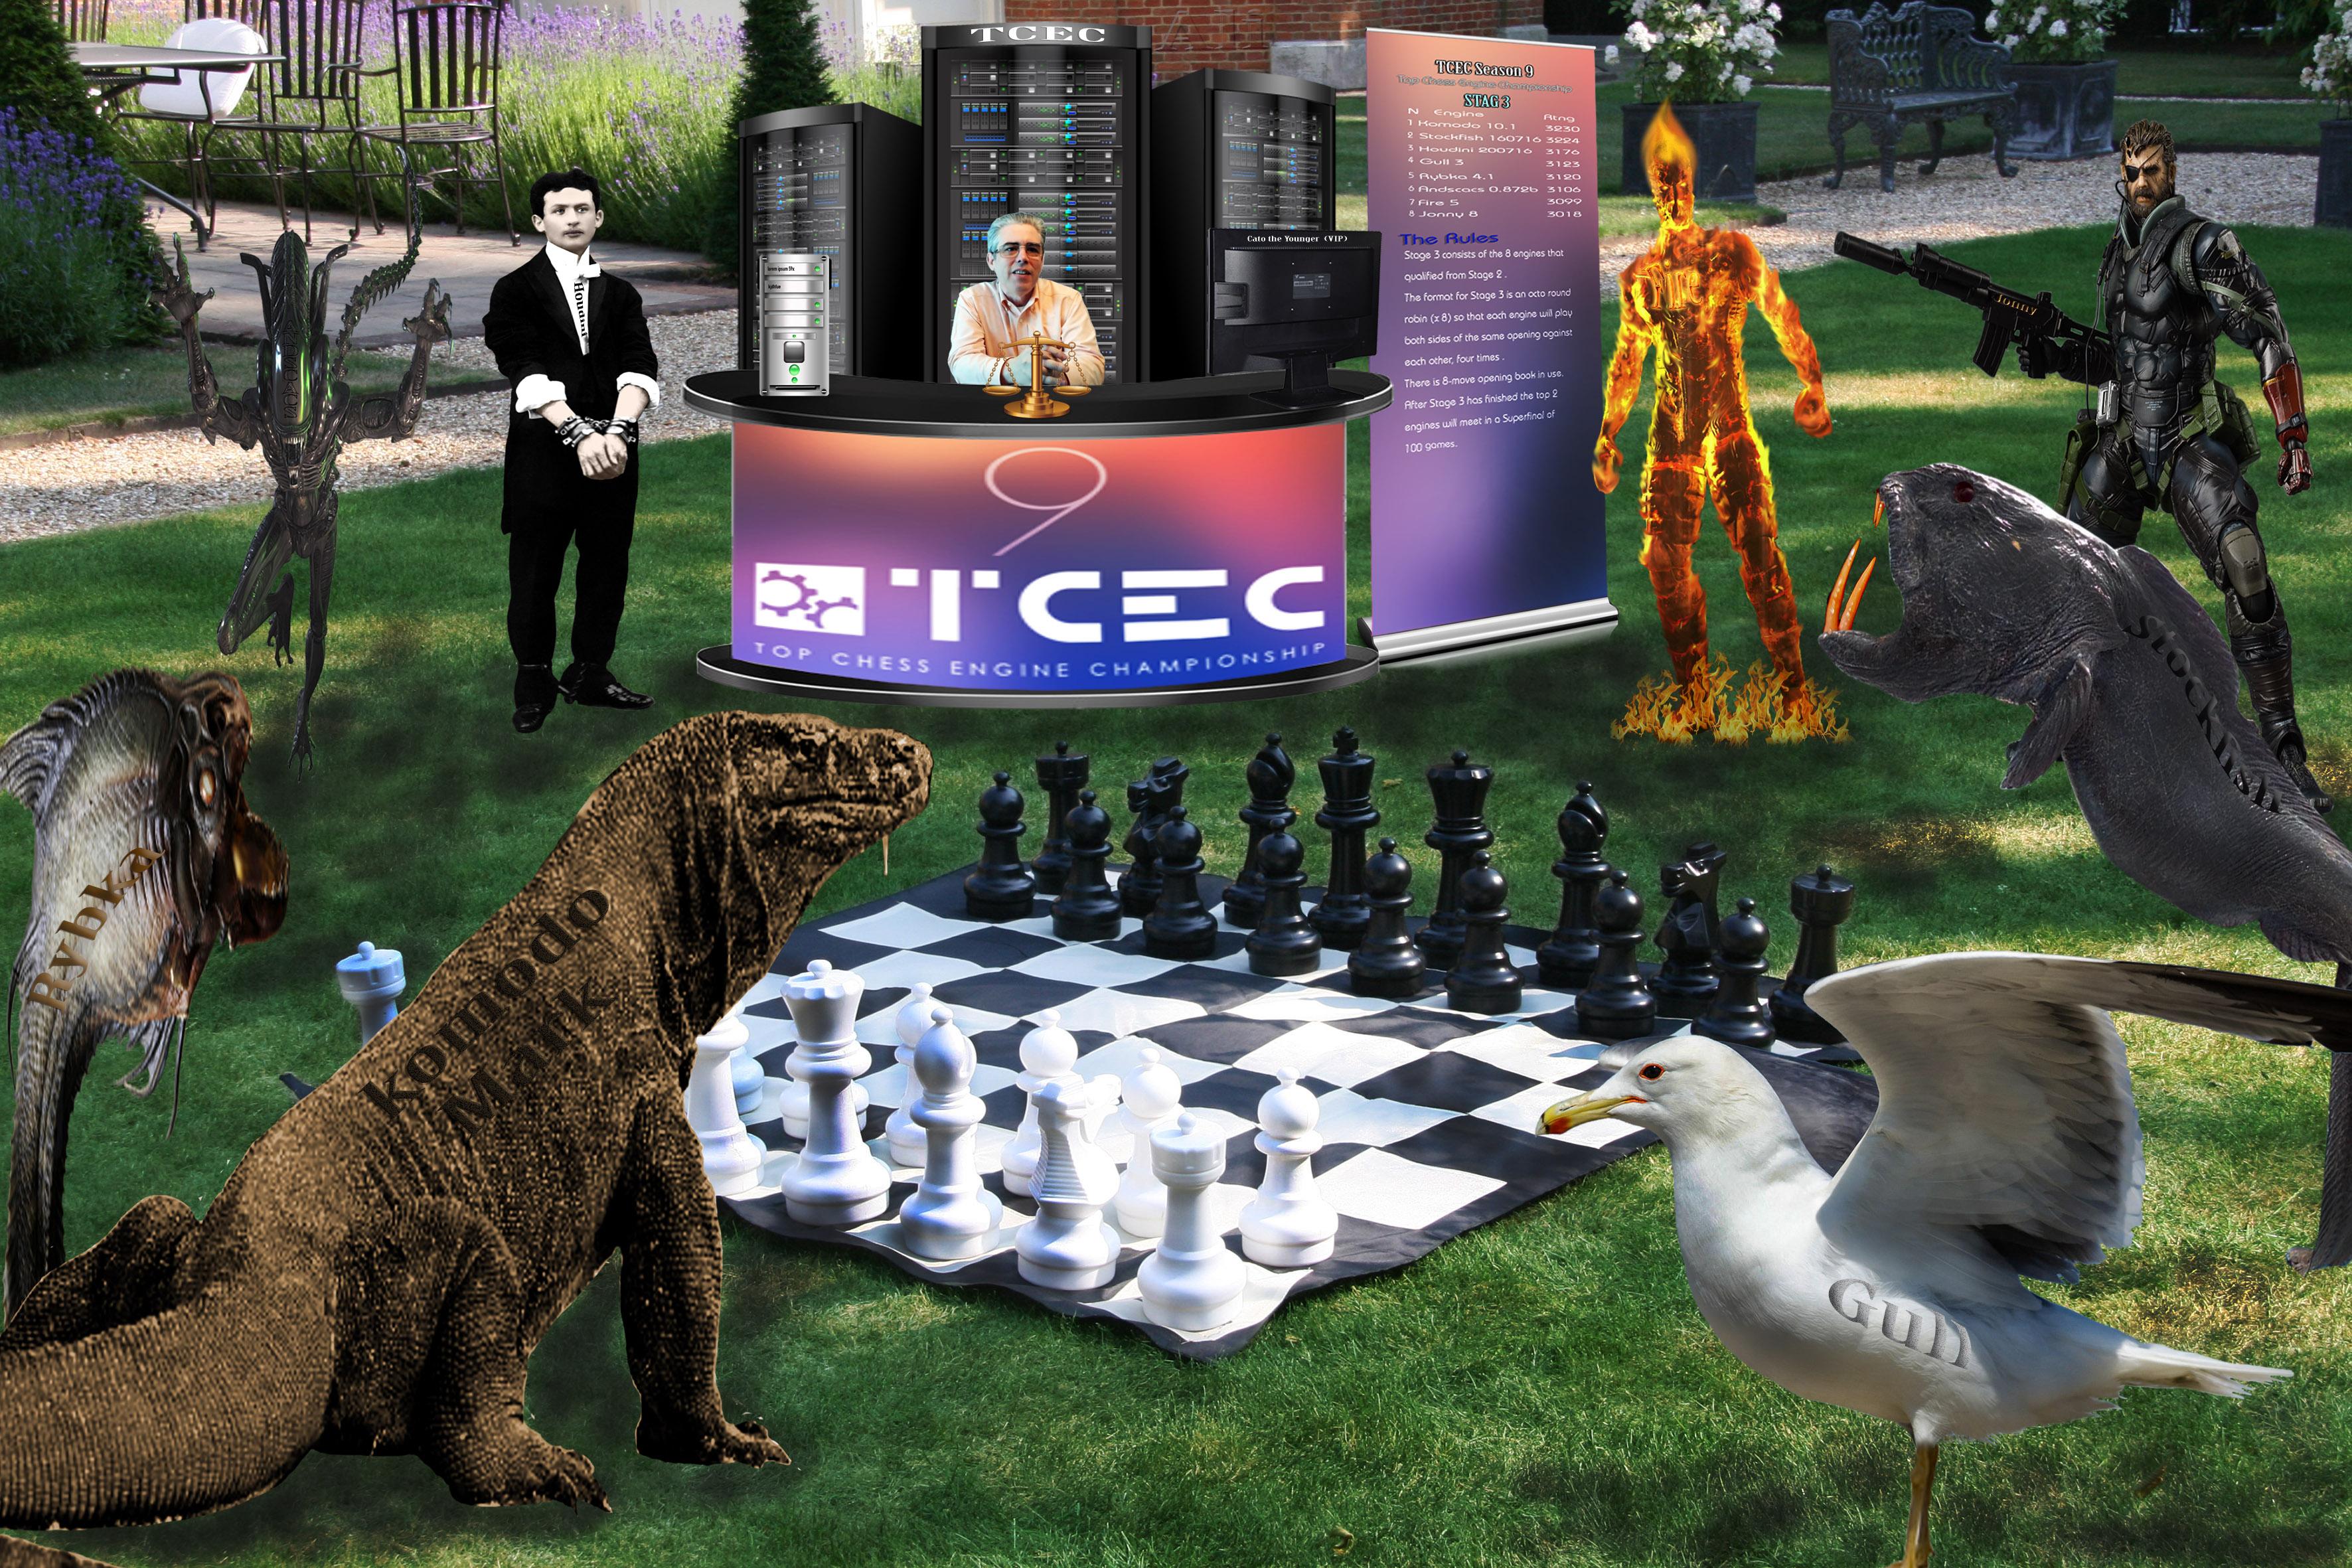 Top Chess Engine Championship